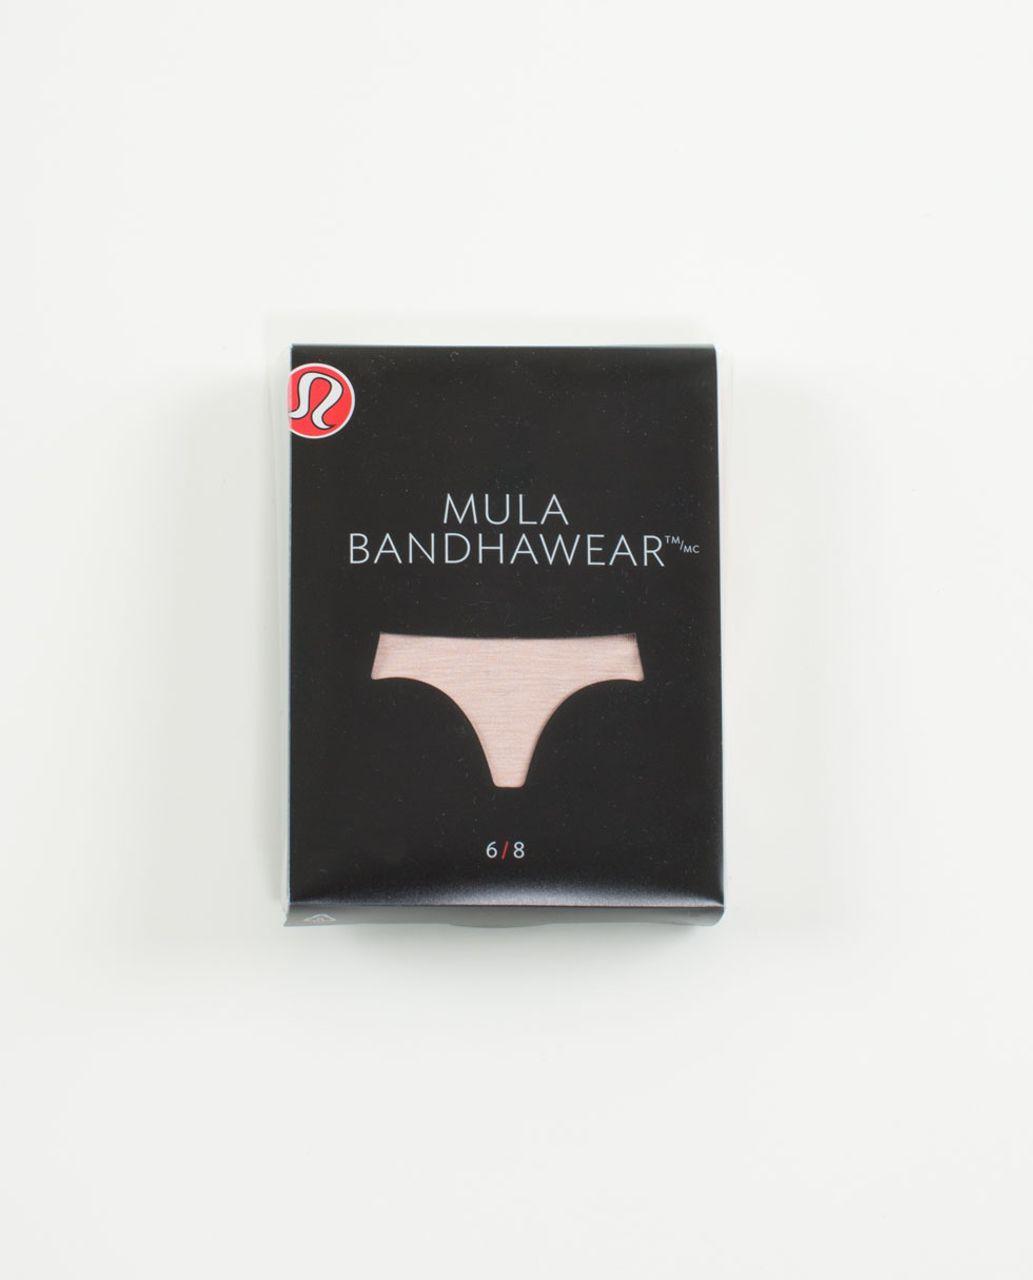 Lululemon Mula Bandhawear Bikini - Bare Bum